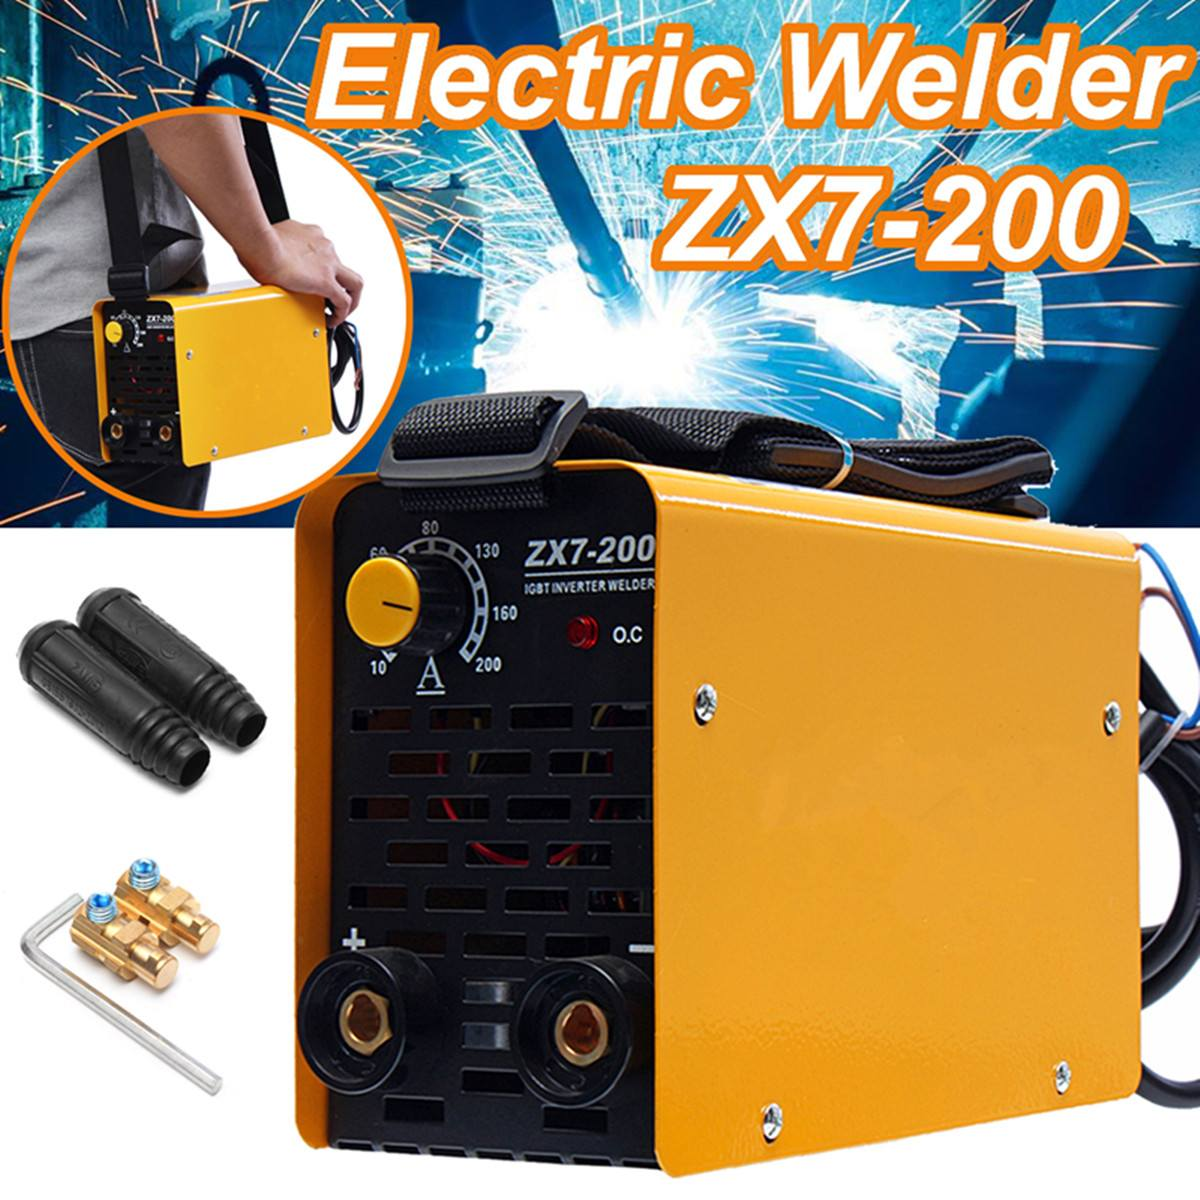 ZX7 200 Mini Electric Welding Machine Portable Solder 220V 40W 10 200A IGBT Inverter  Cooling Soldering Tool Welding Working|Arc Welders| |  - title=